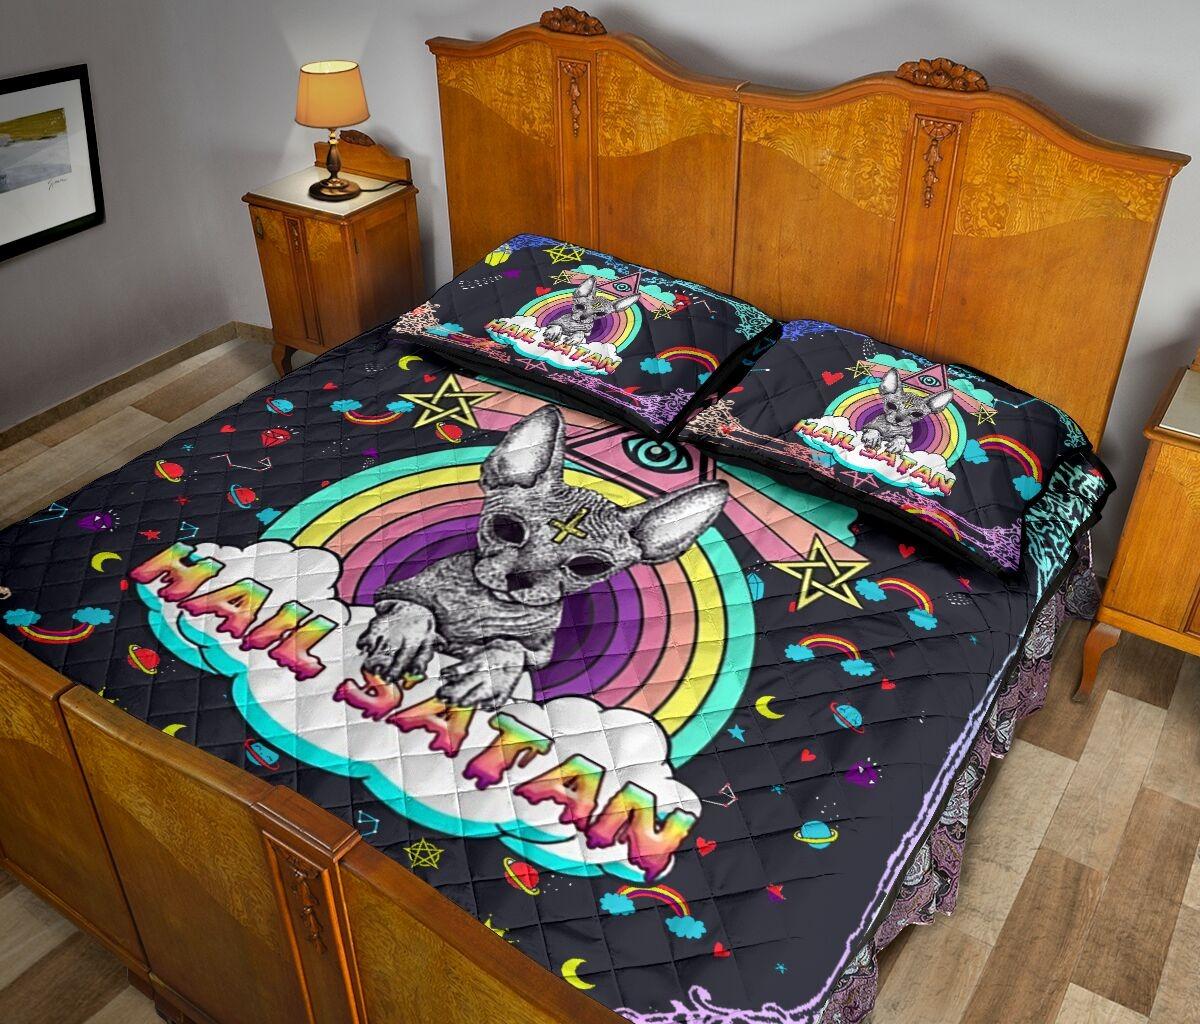 Sphyn hail satan quilt bedding set3